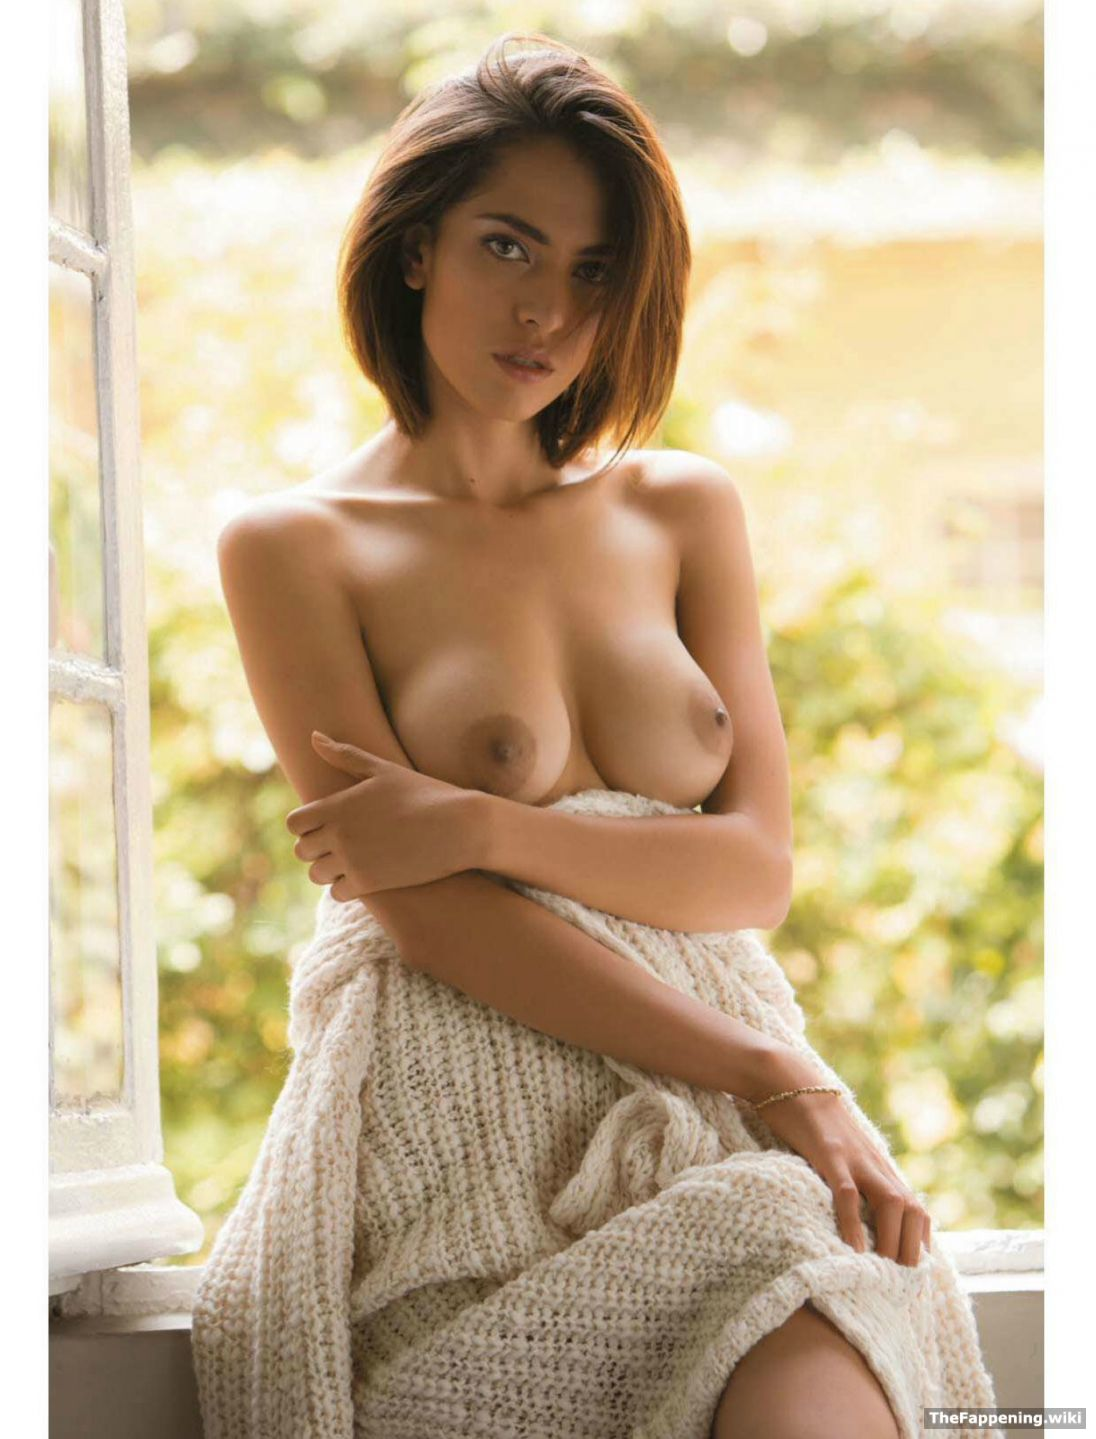 Paula Jimenez Nude Pics  Vids - The Fappening-4952